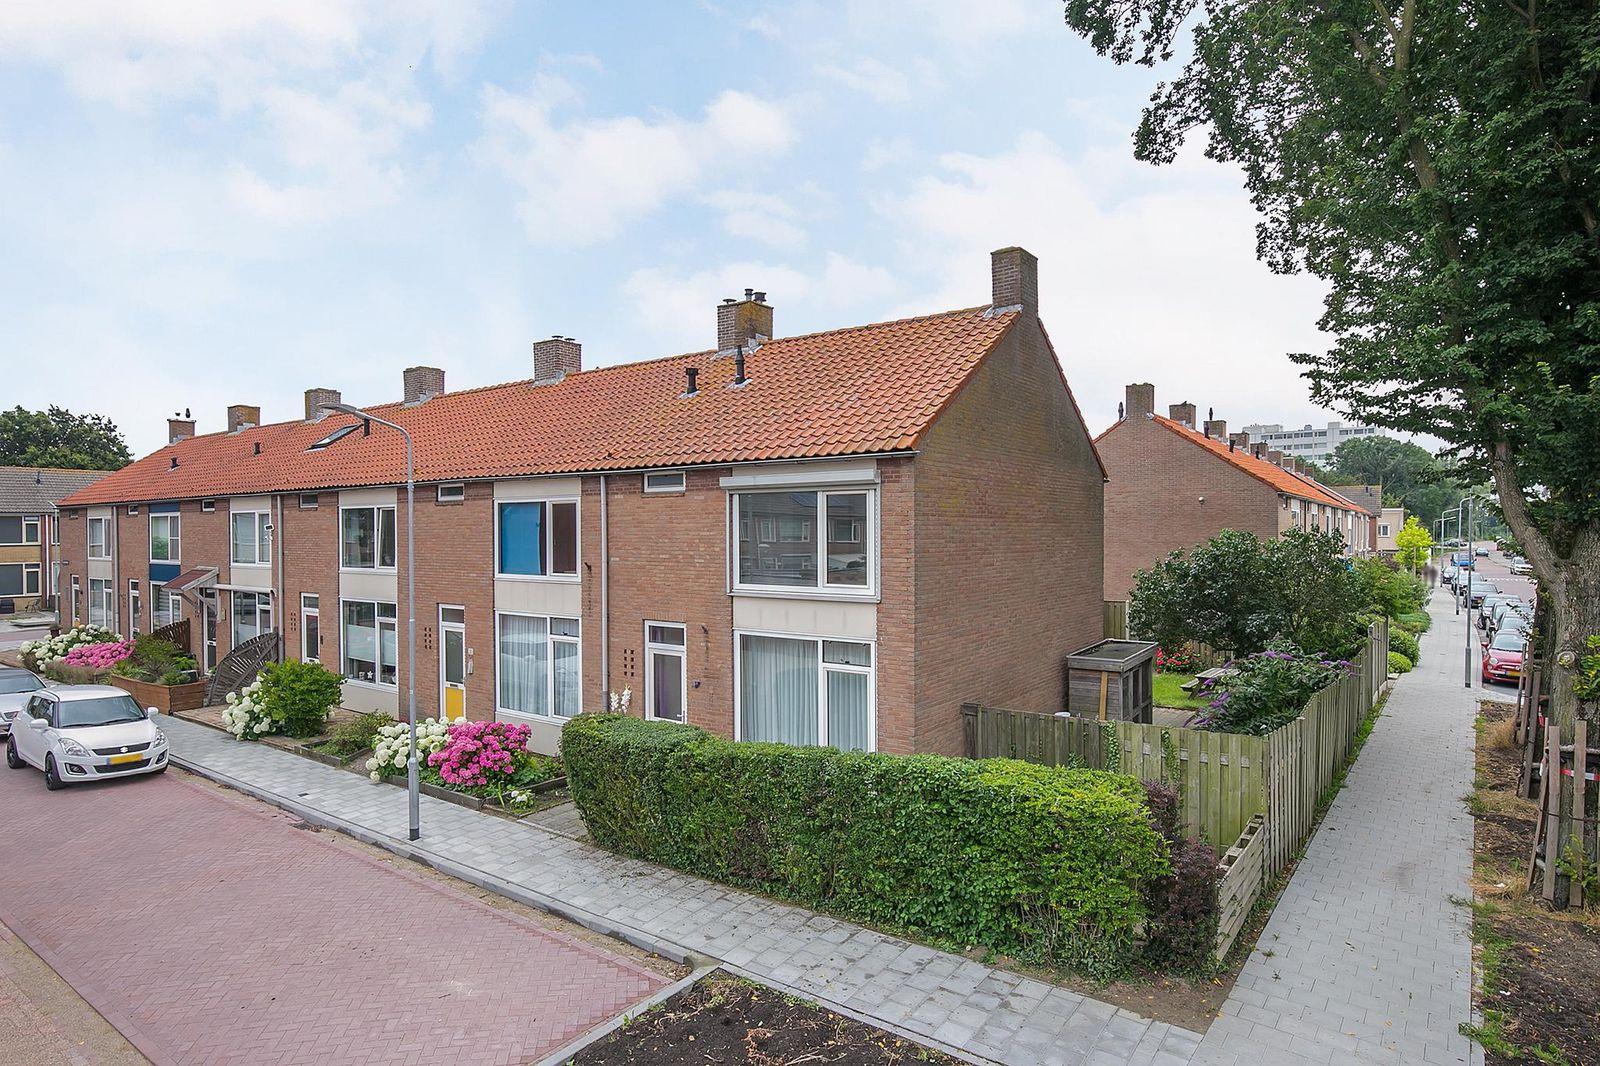 Platanenstraat 35, Oost-souburg